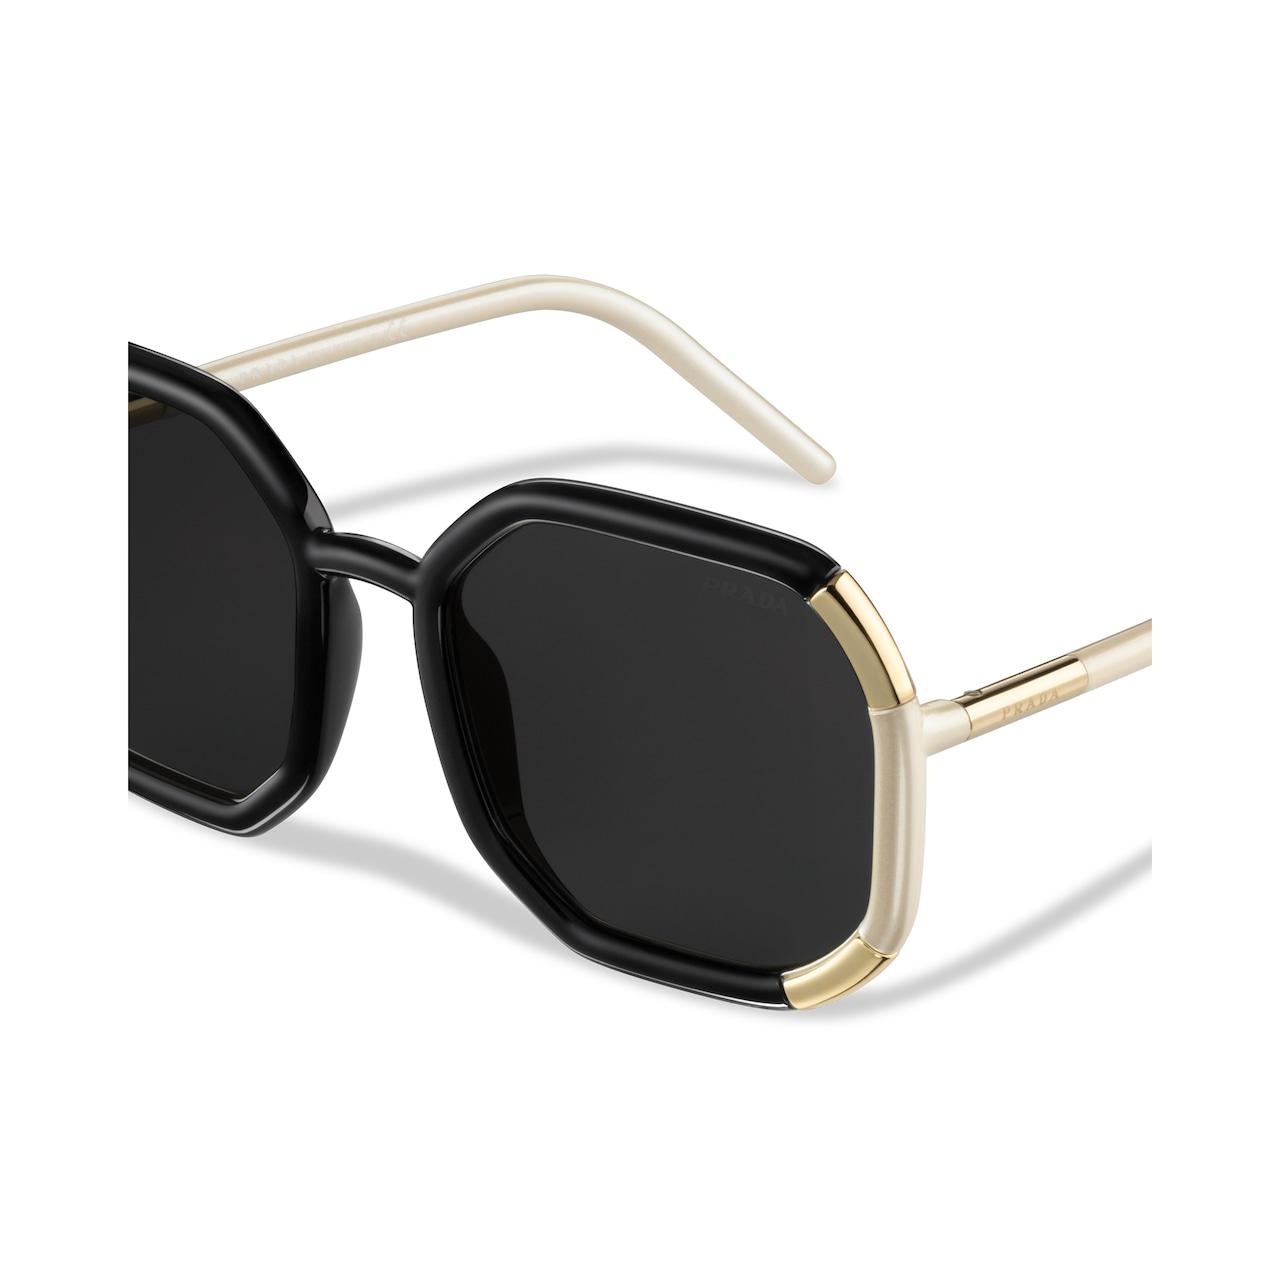 Prada Prada Decode sunglasses 5